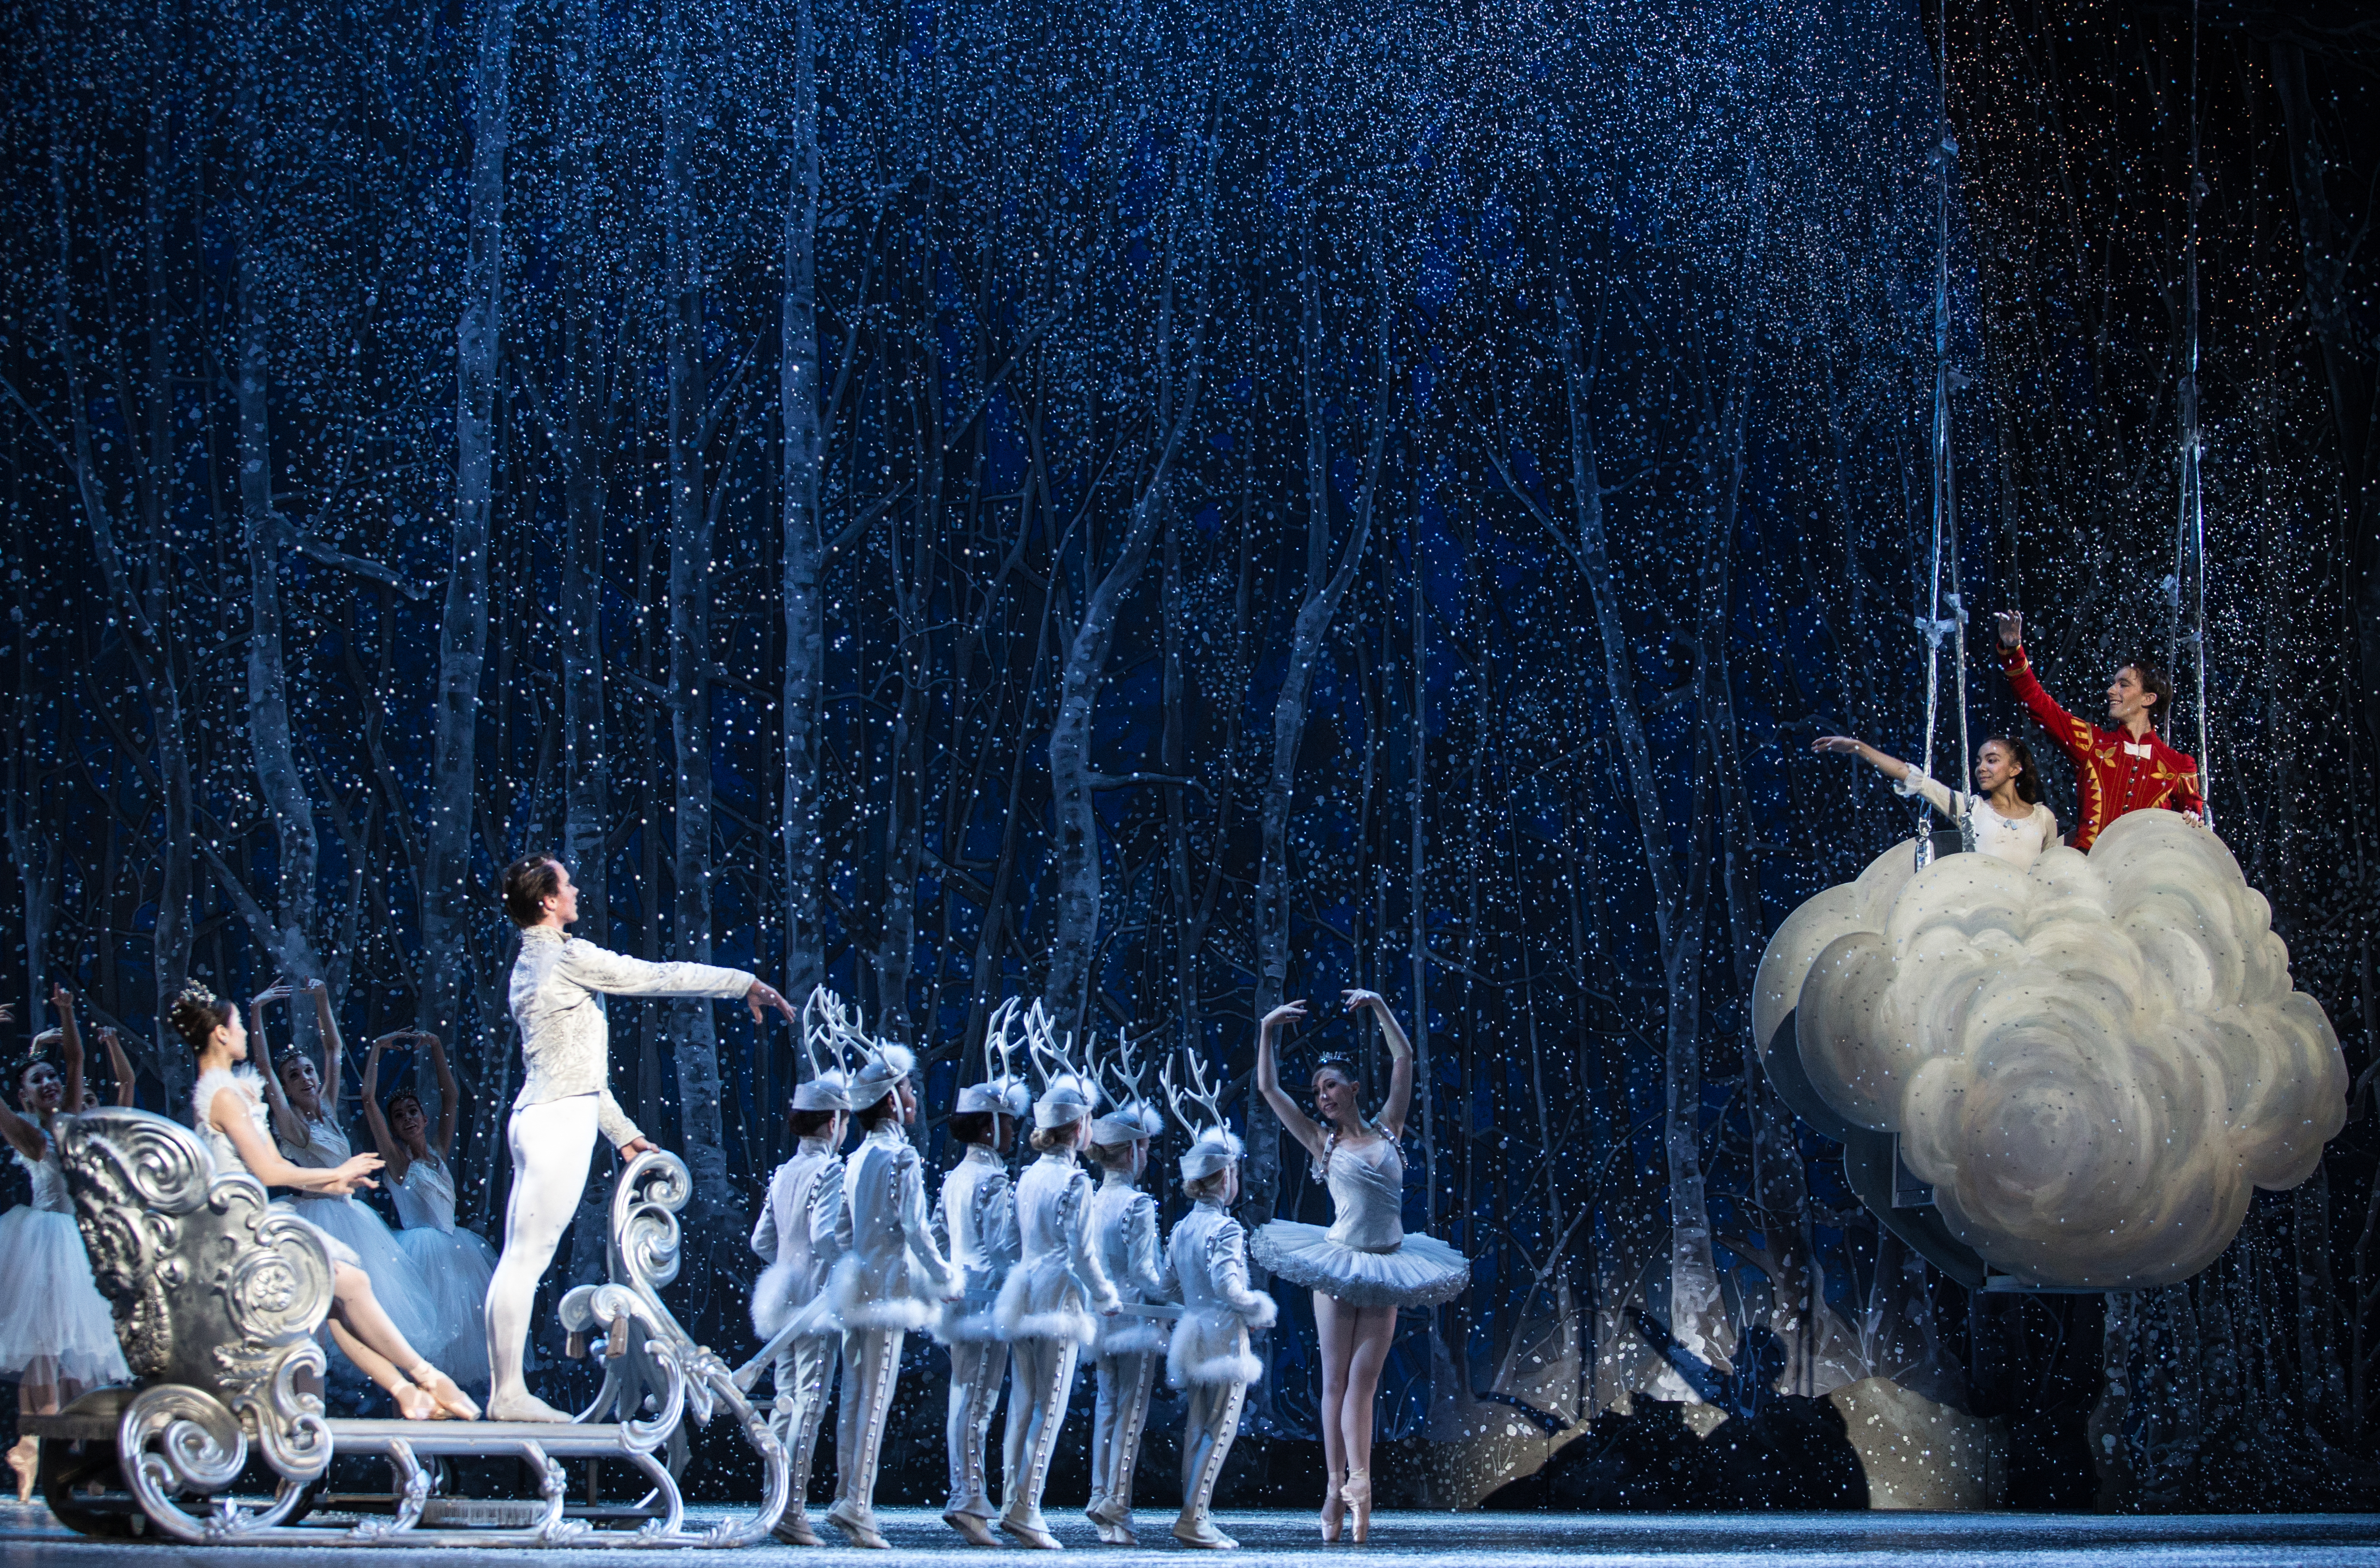 "BOSTON, November 25, 2016 – Boston Ballet's Seo Hye Han and Paul Craig as Snow Queen and King, farewell to Clara, Della Wada-Gill, and The Nutcraker Prince, Patrick Yogum, at dress rehearsal of ""The Nutcracker."" Photo by Kankanit Wiriyasajja."